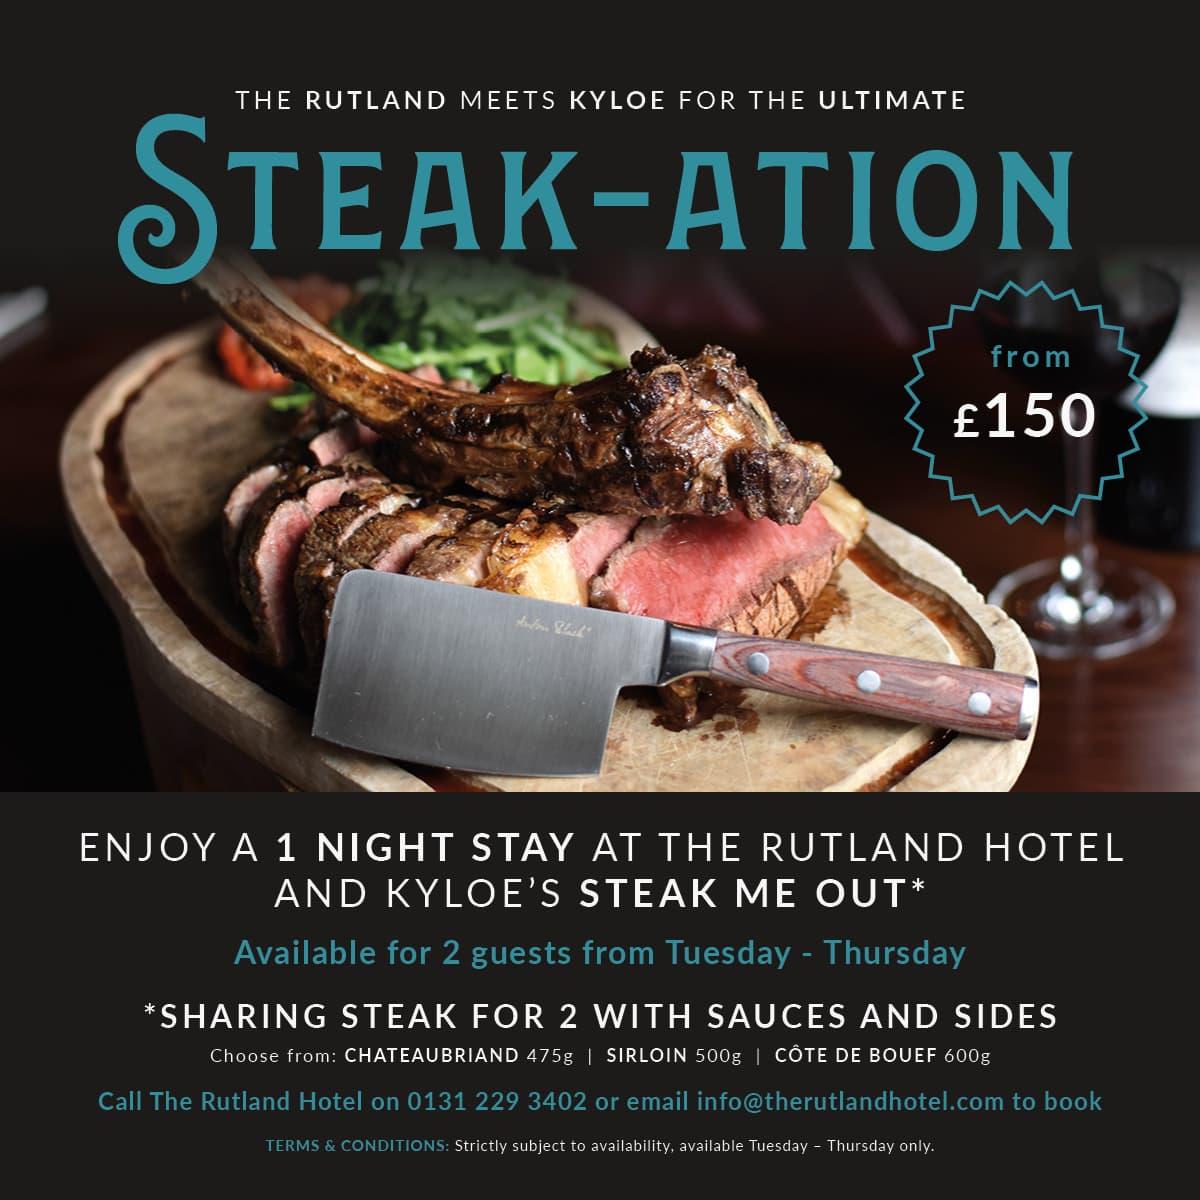 The Rutland Hotel Edinburgh Steak-ation Deal